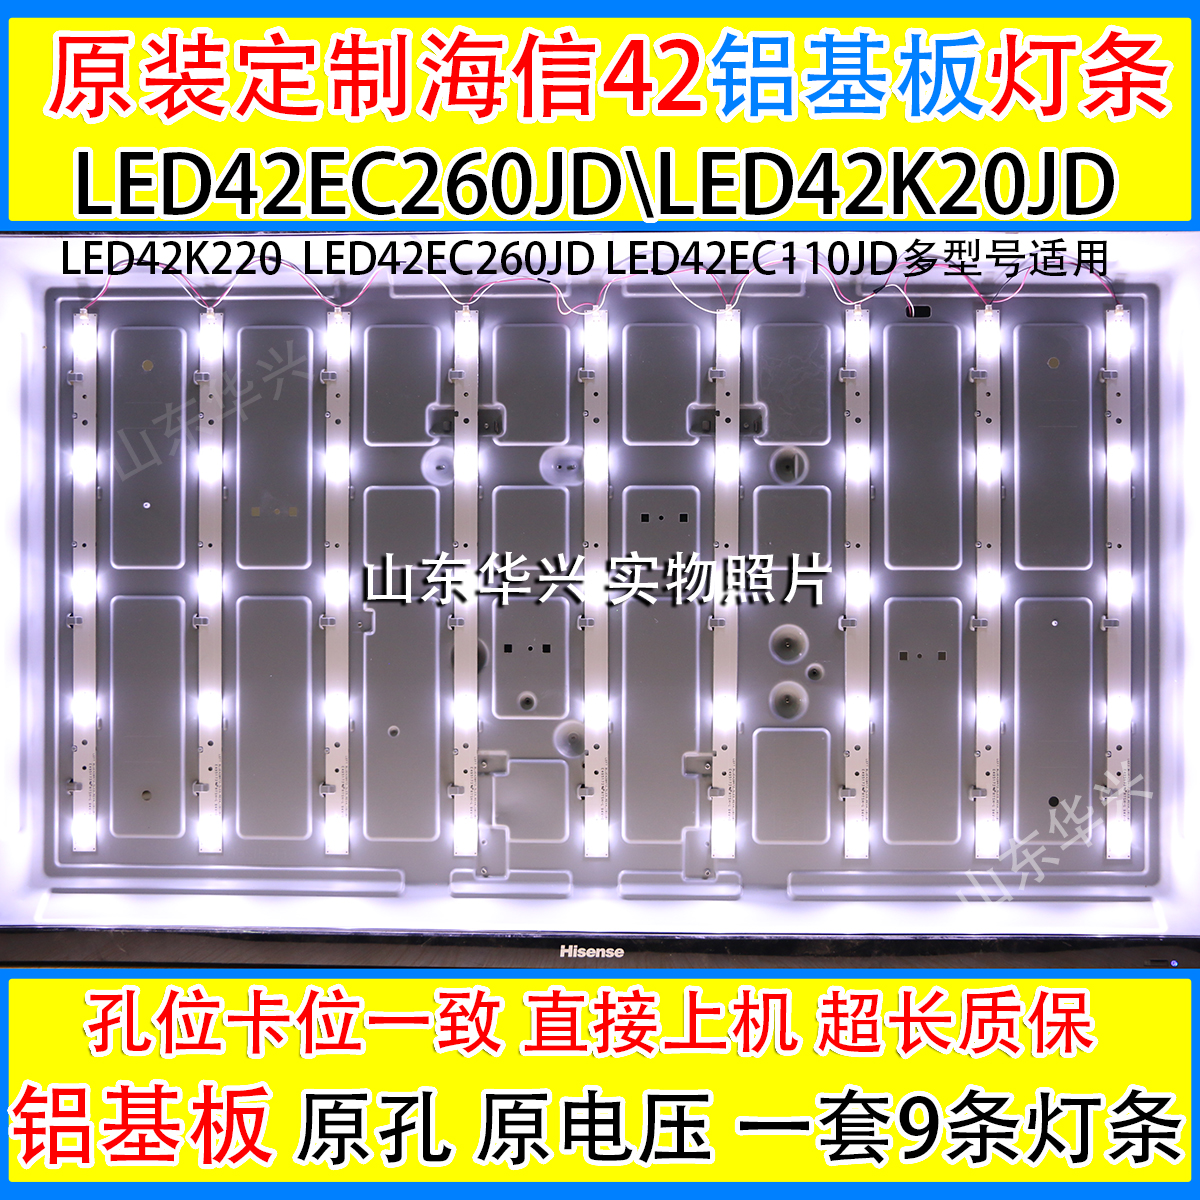 包邮海信液晶电视LED42EC260JD背光LED灯条LED42K20JD全套LED灯条